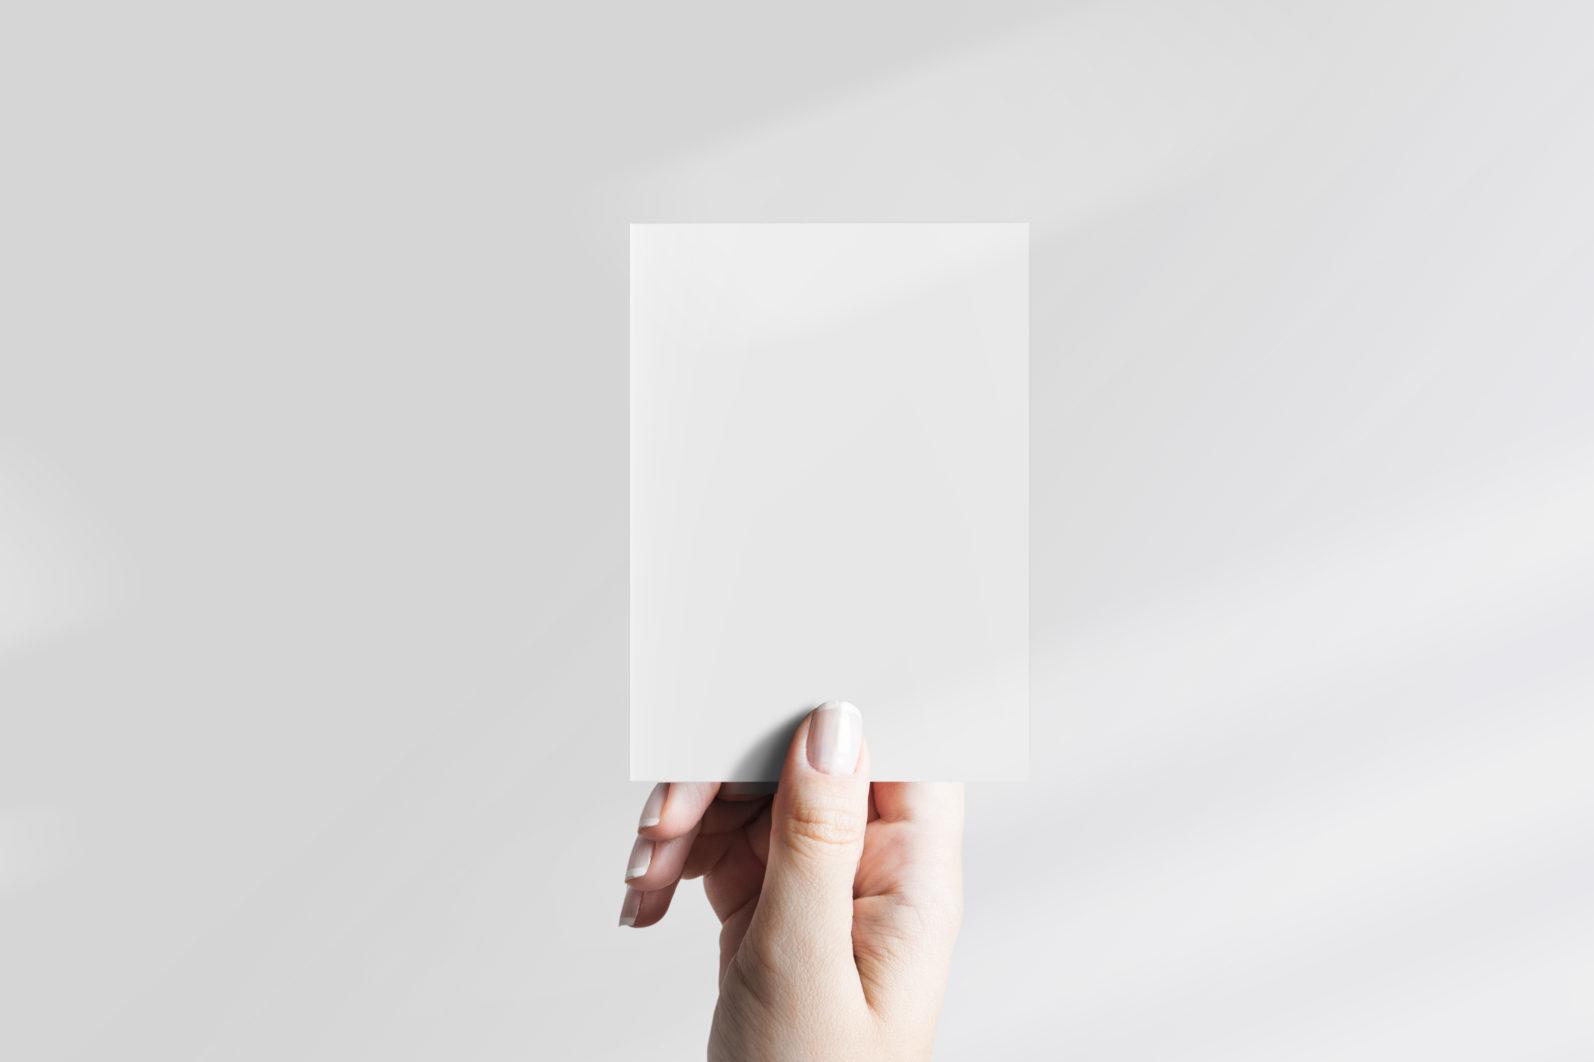 Card Mockup, Poster Mockup, Photo Mockup #780 | PSD + Smart Object - 780 JPEG scaled -